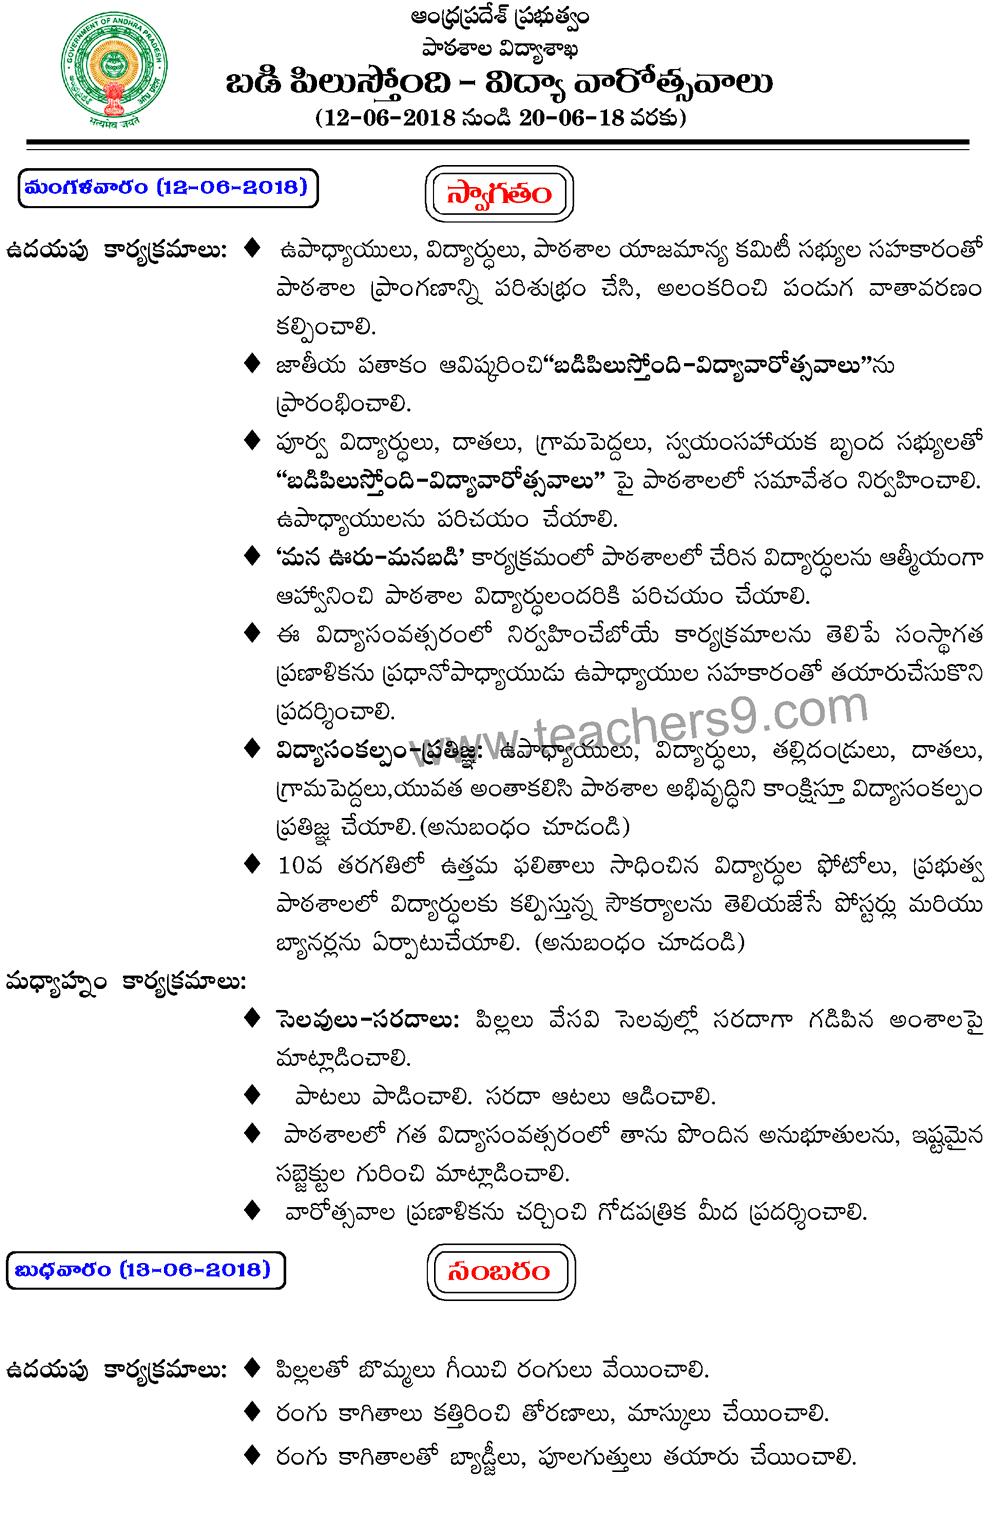 Badi Pilustundi -Vidya Varotsavalu day wise schedule